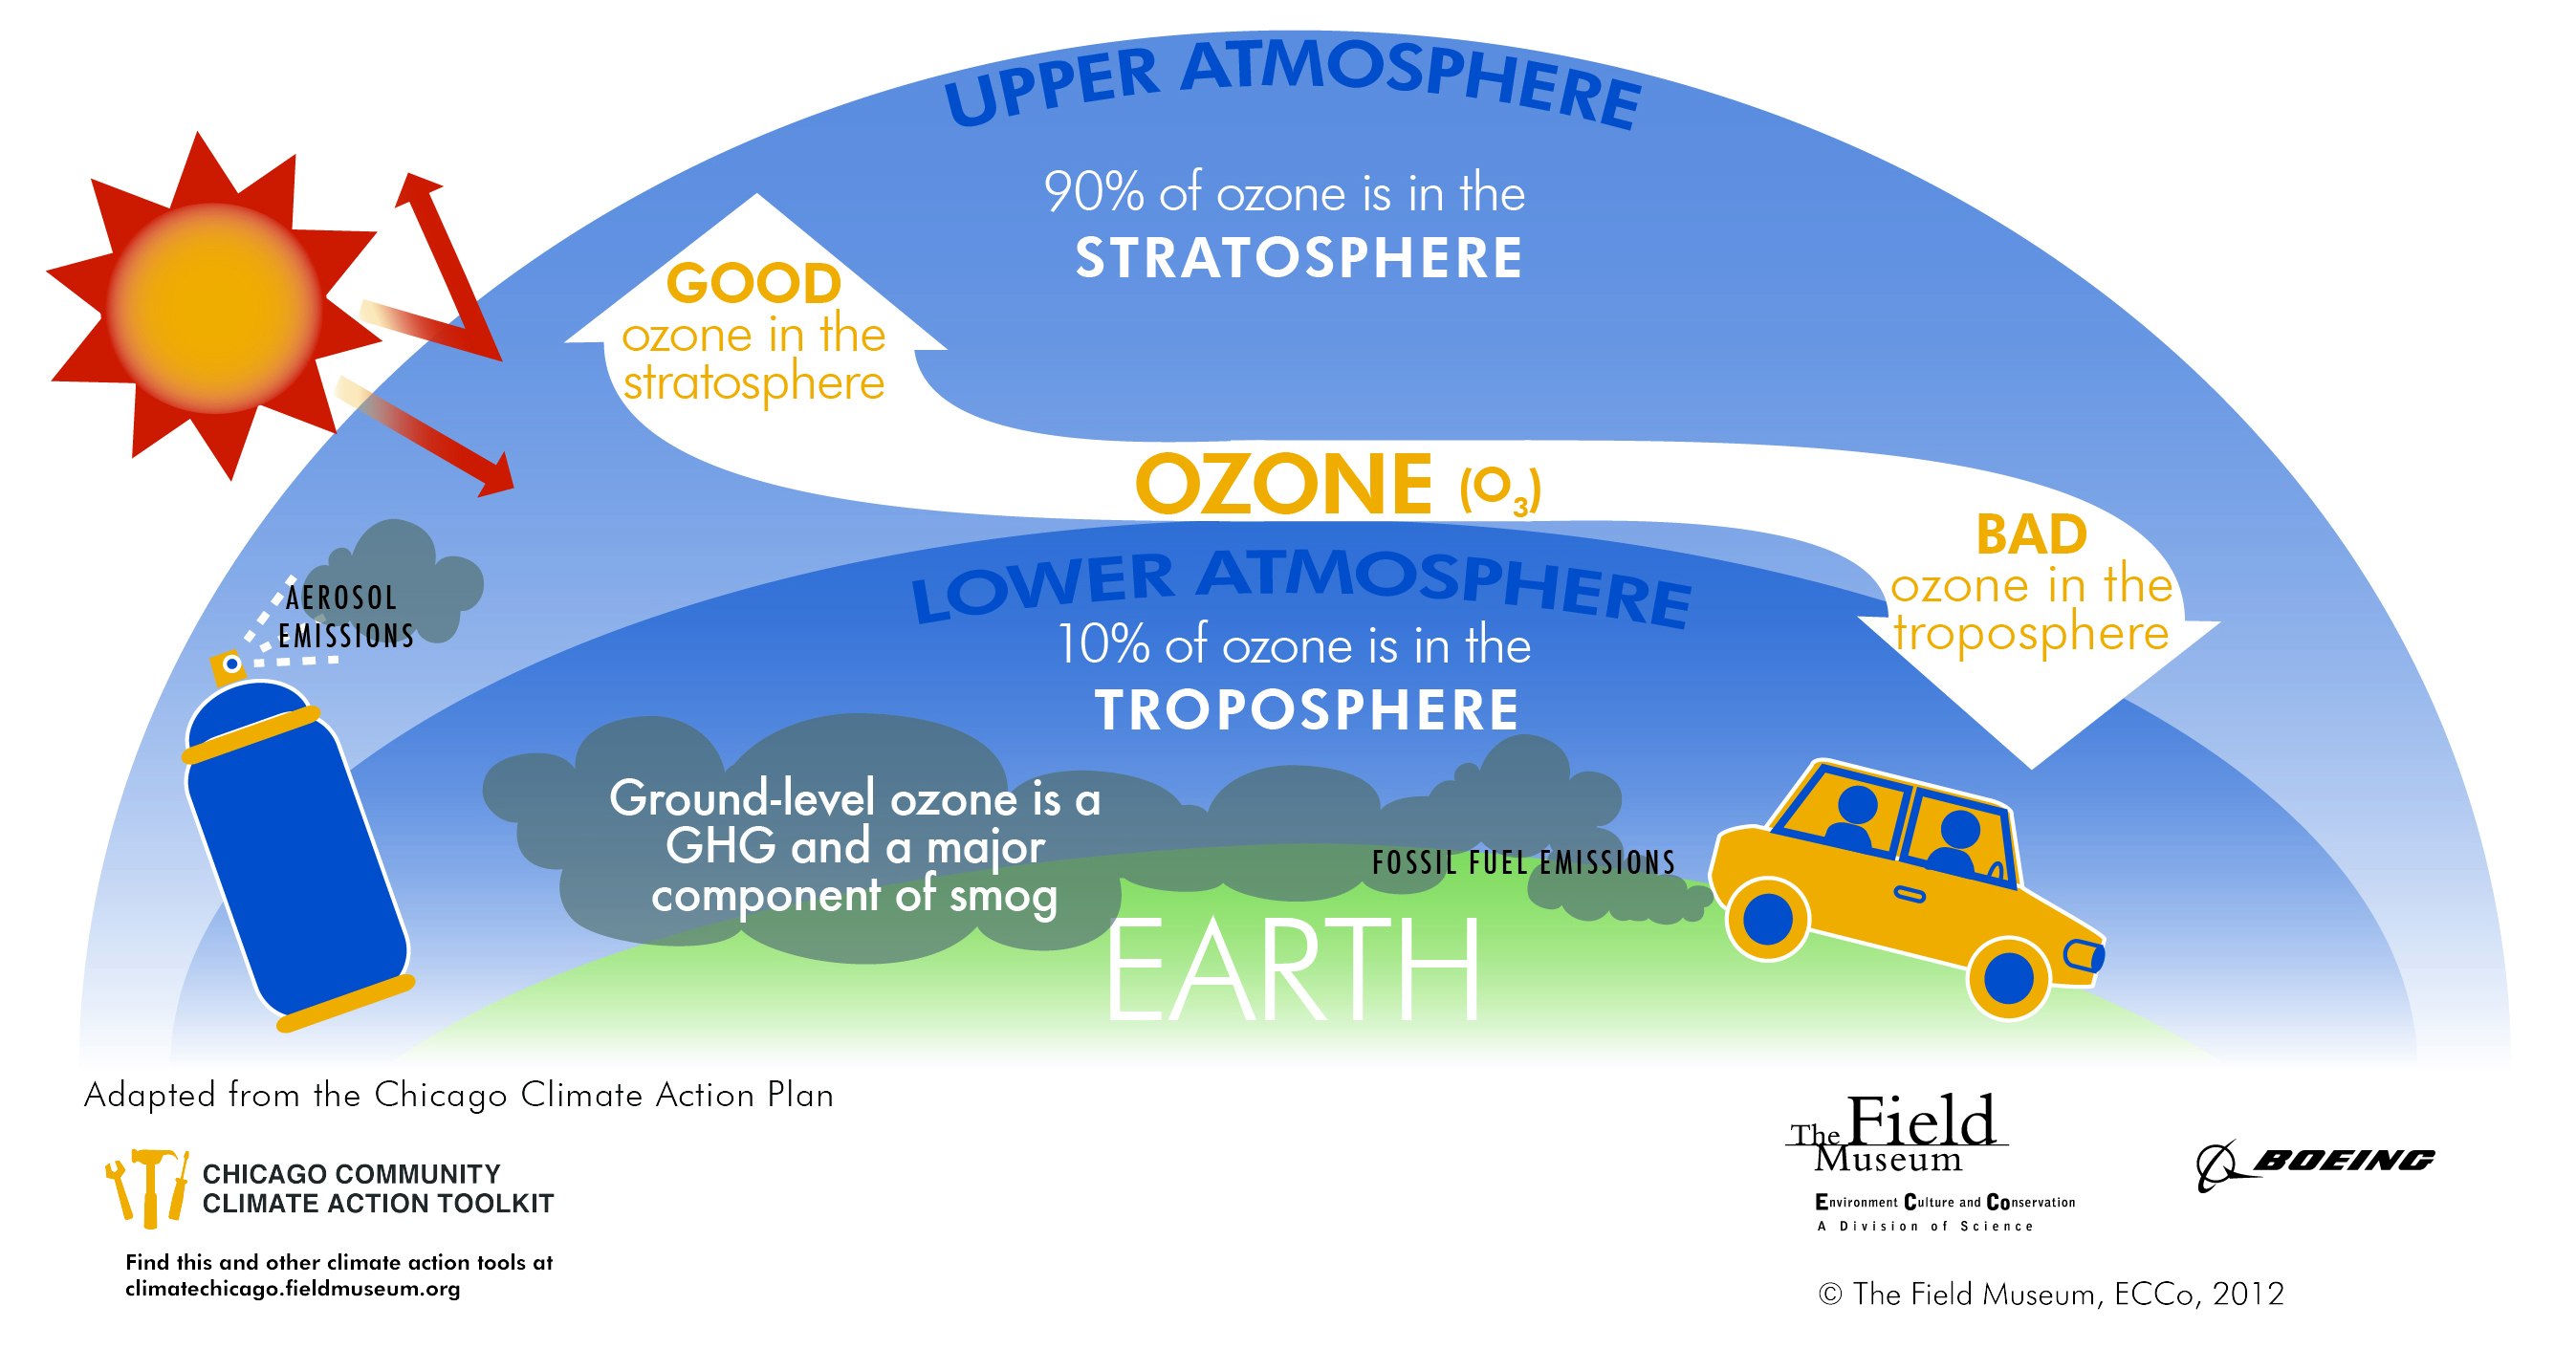 Ozone Hole Repair